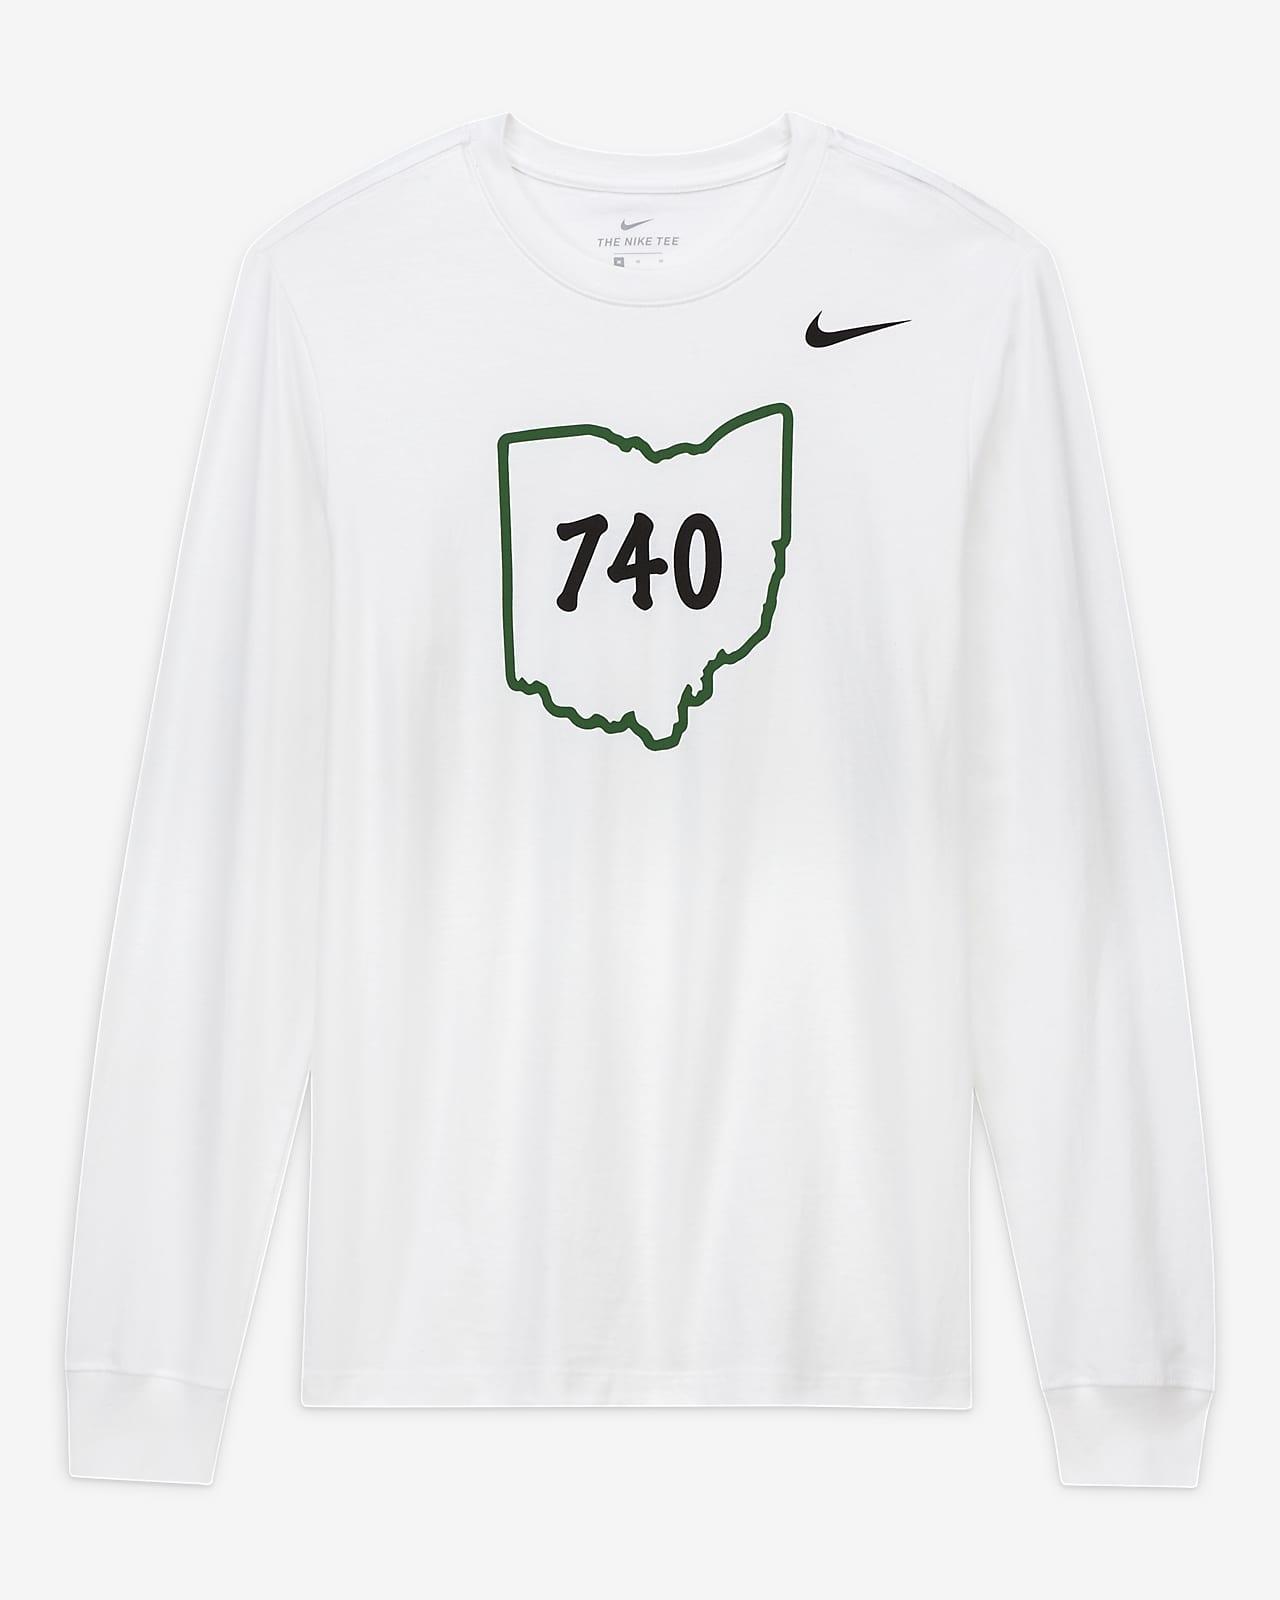 Playera para hombre Nike 740 Area Code